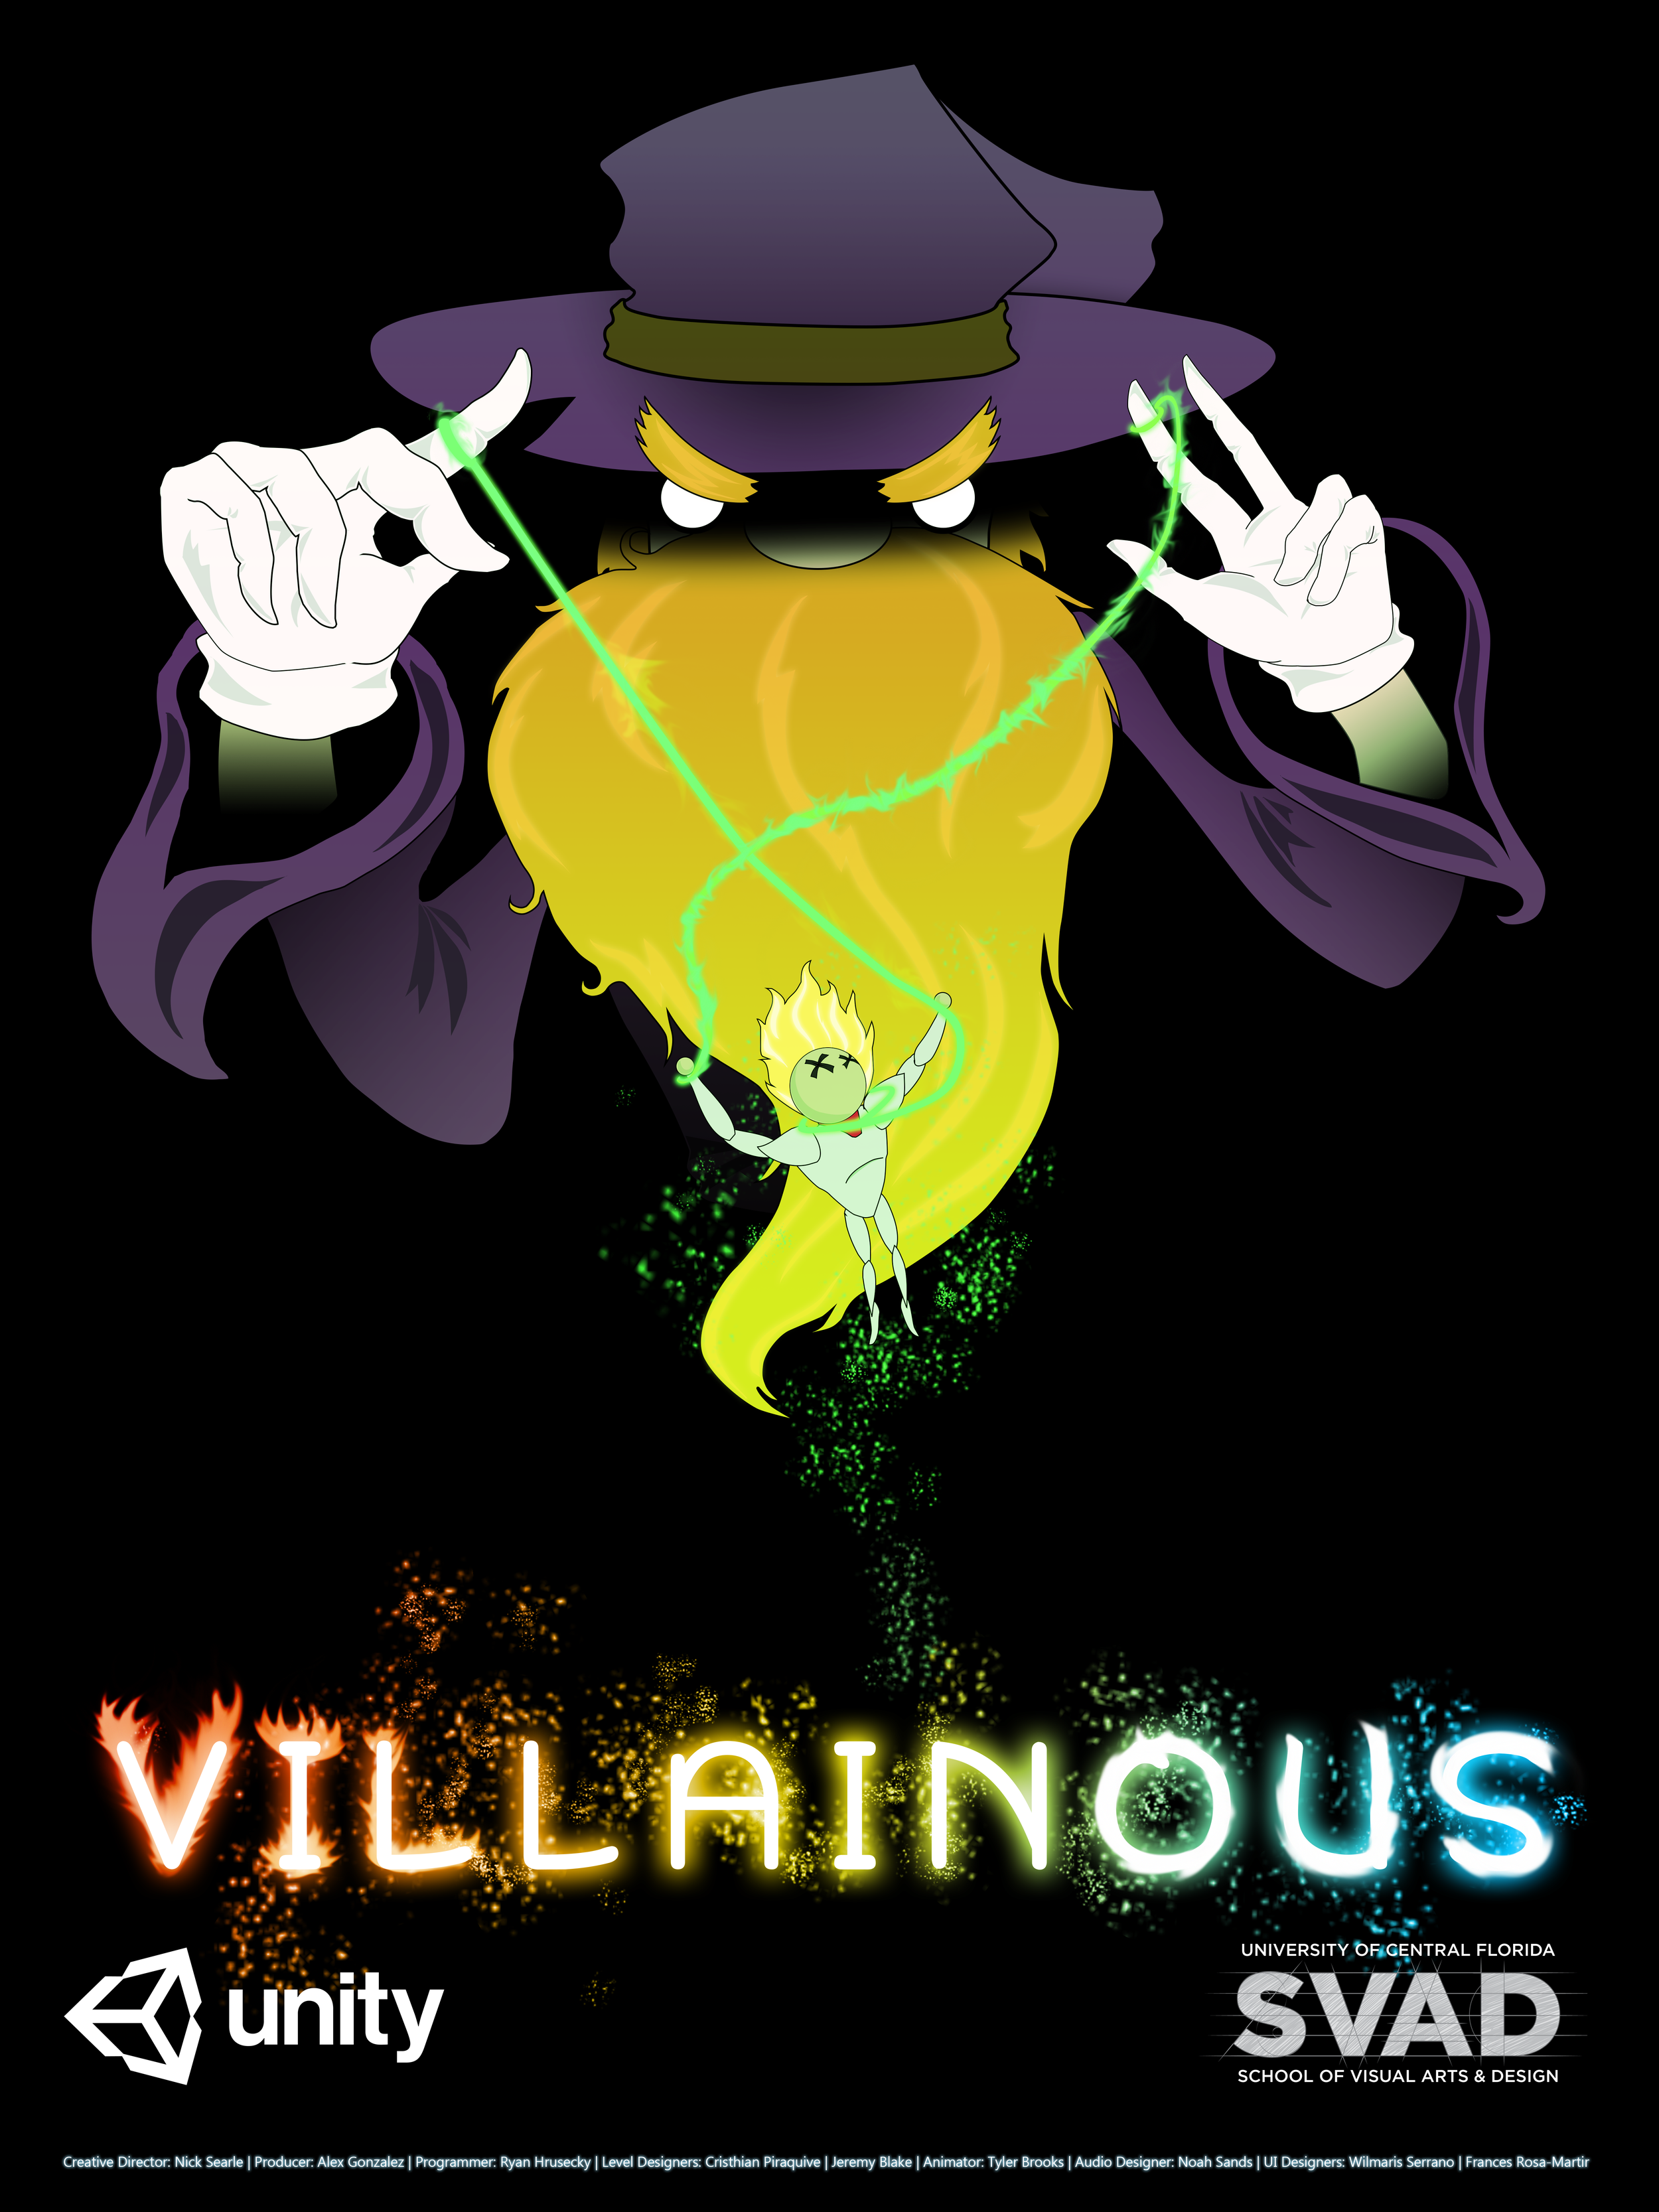 Villainous_Poster.png